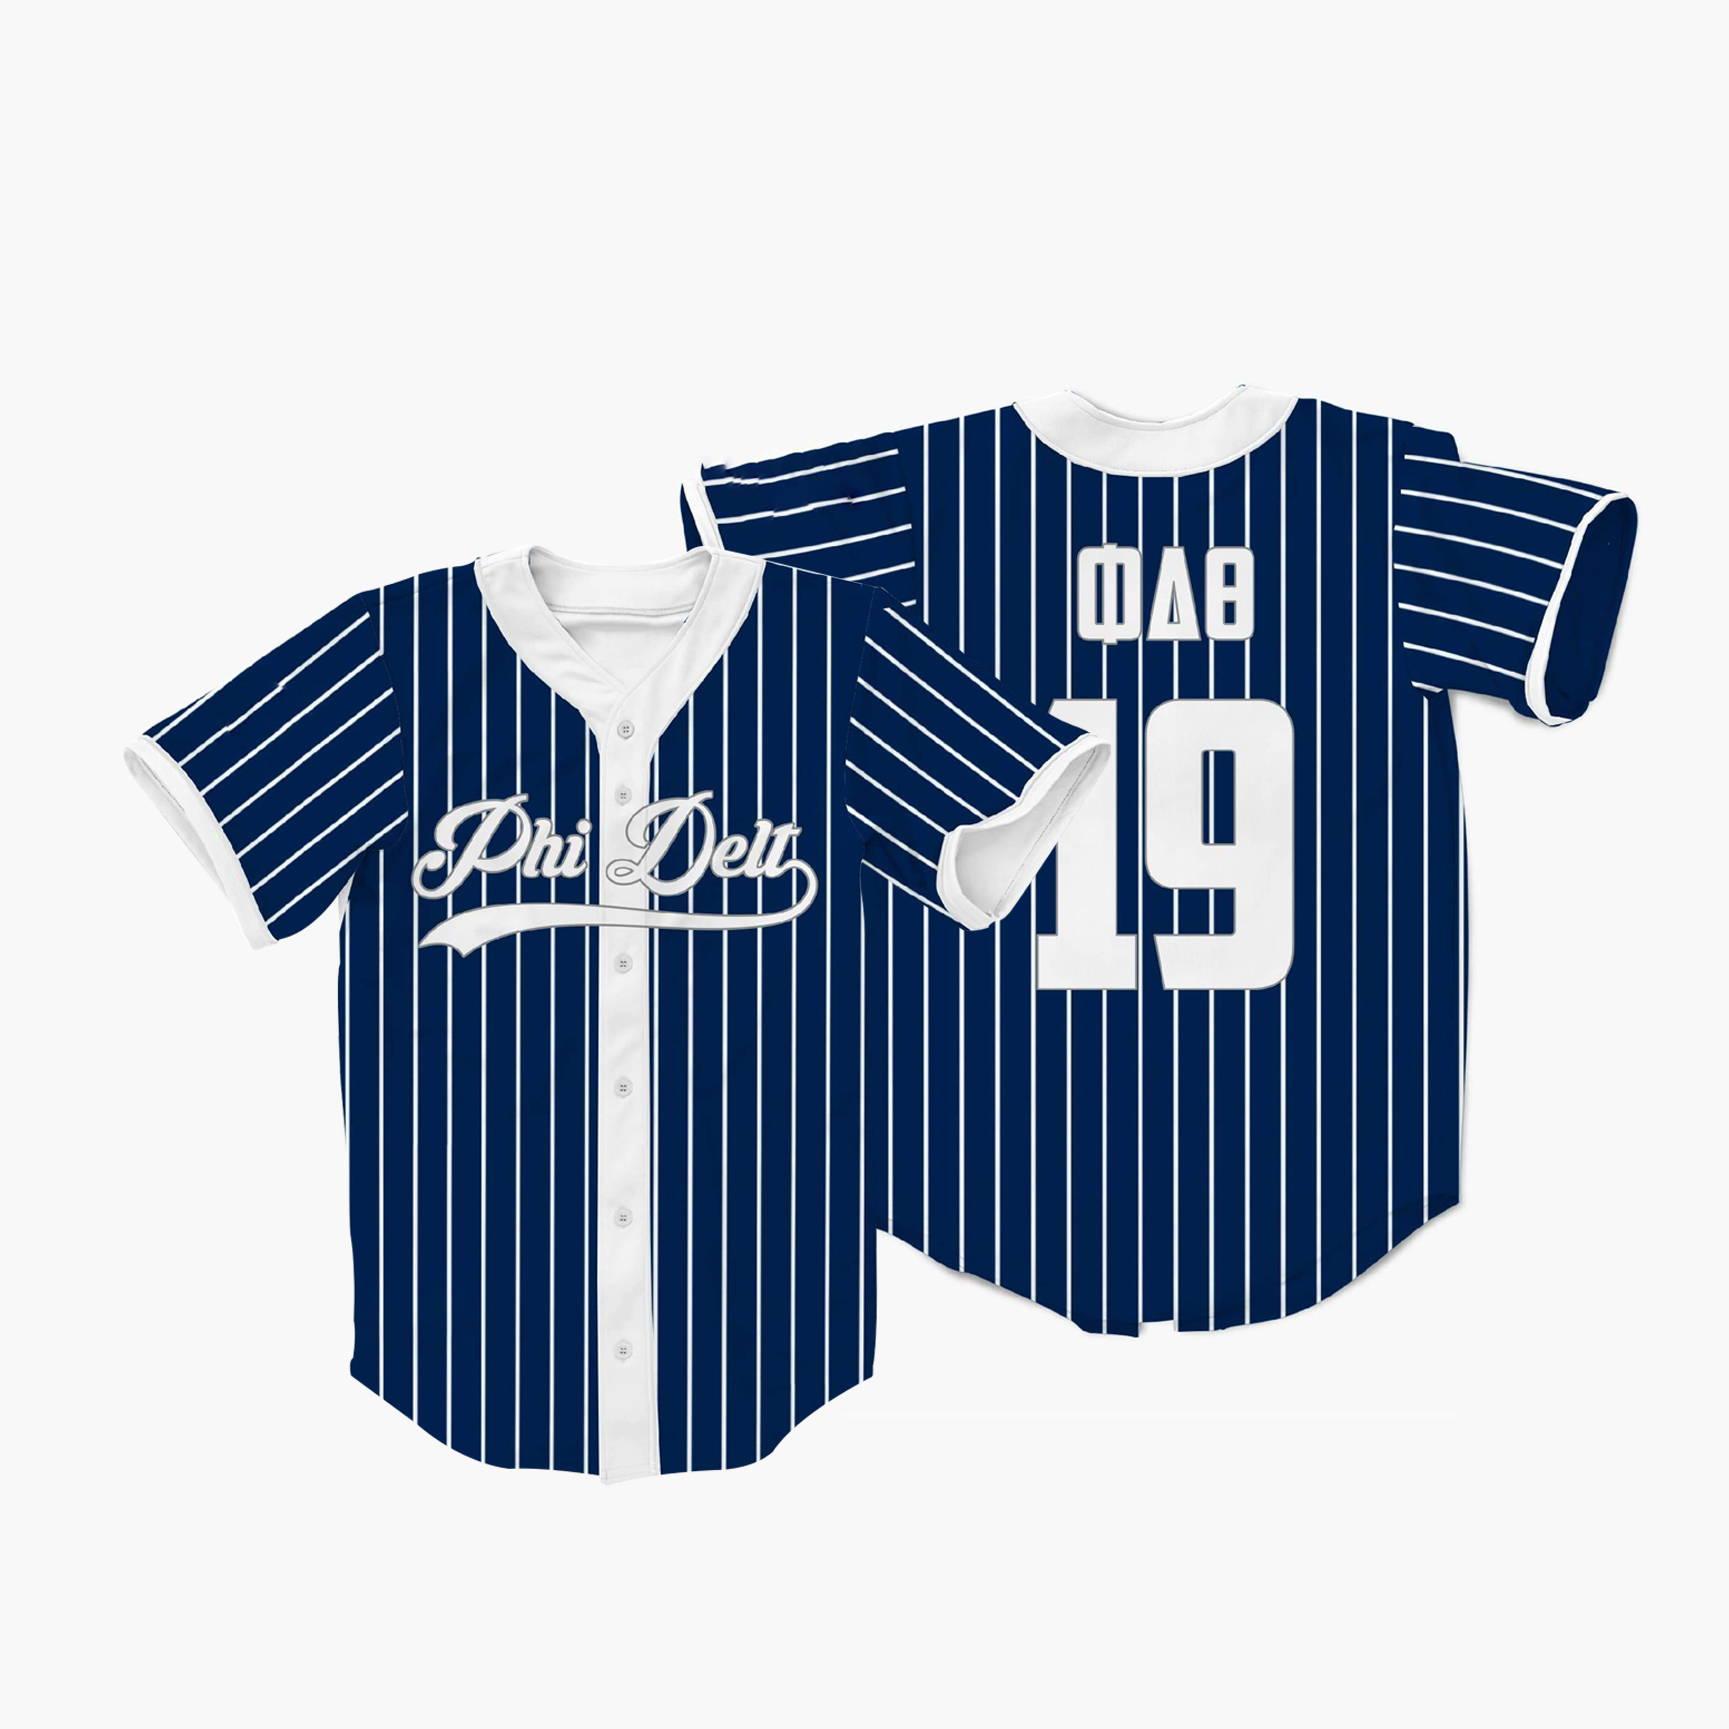 custom design baseball jersey